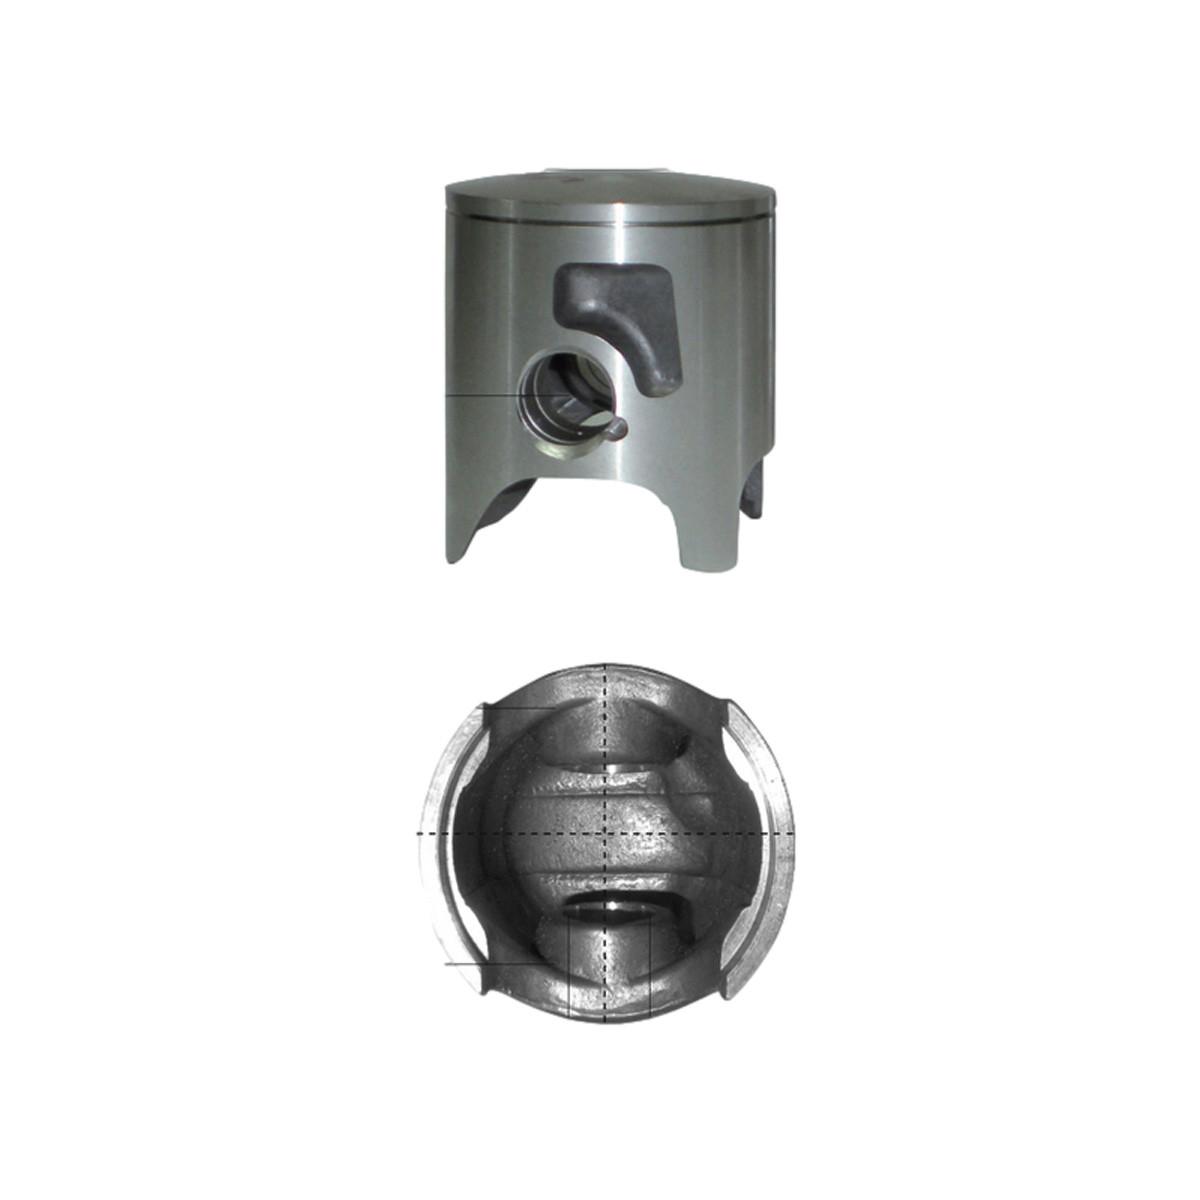 Piston PEUGEOT SYM 4T D.42mm - BARIKIT Axe D.10mm